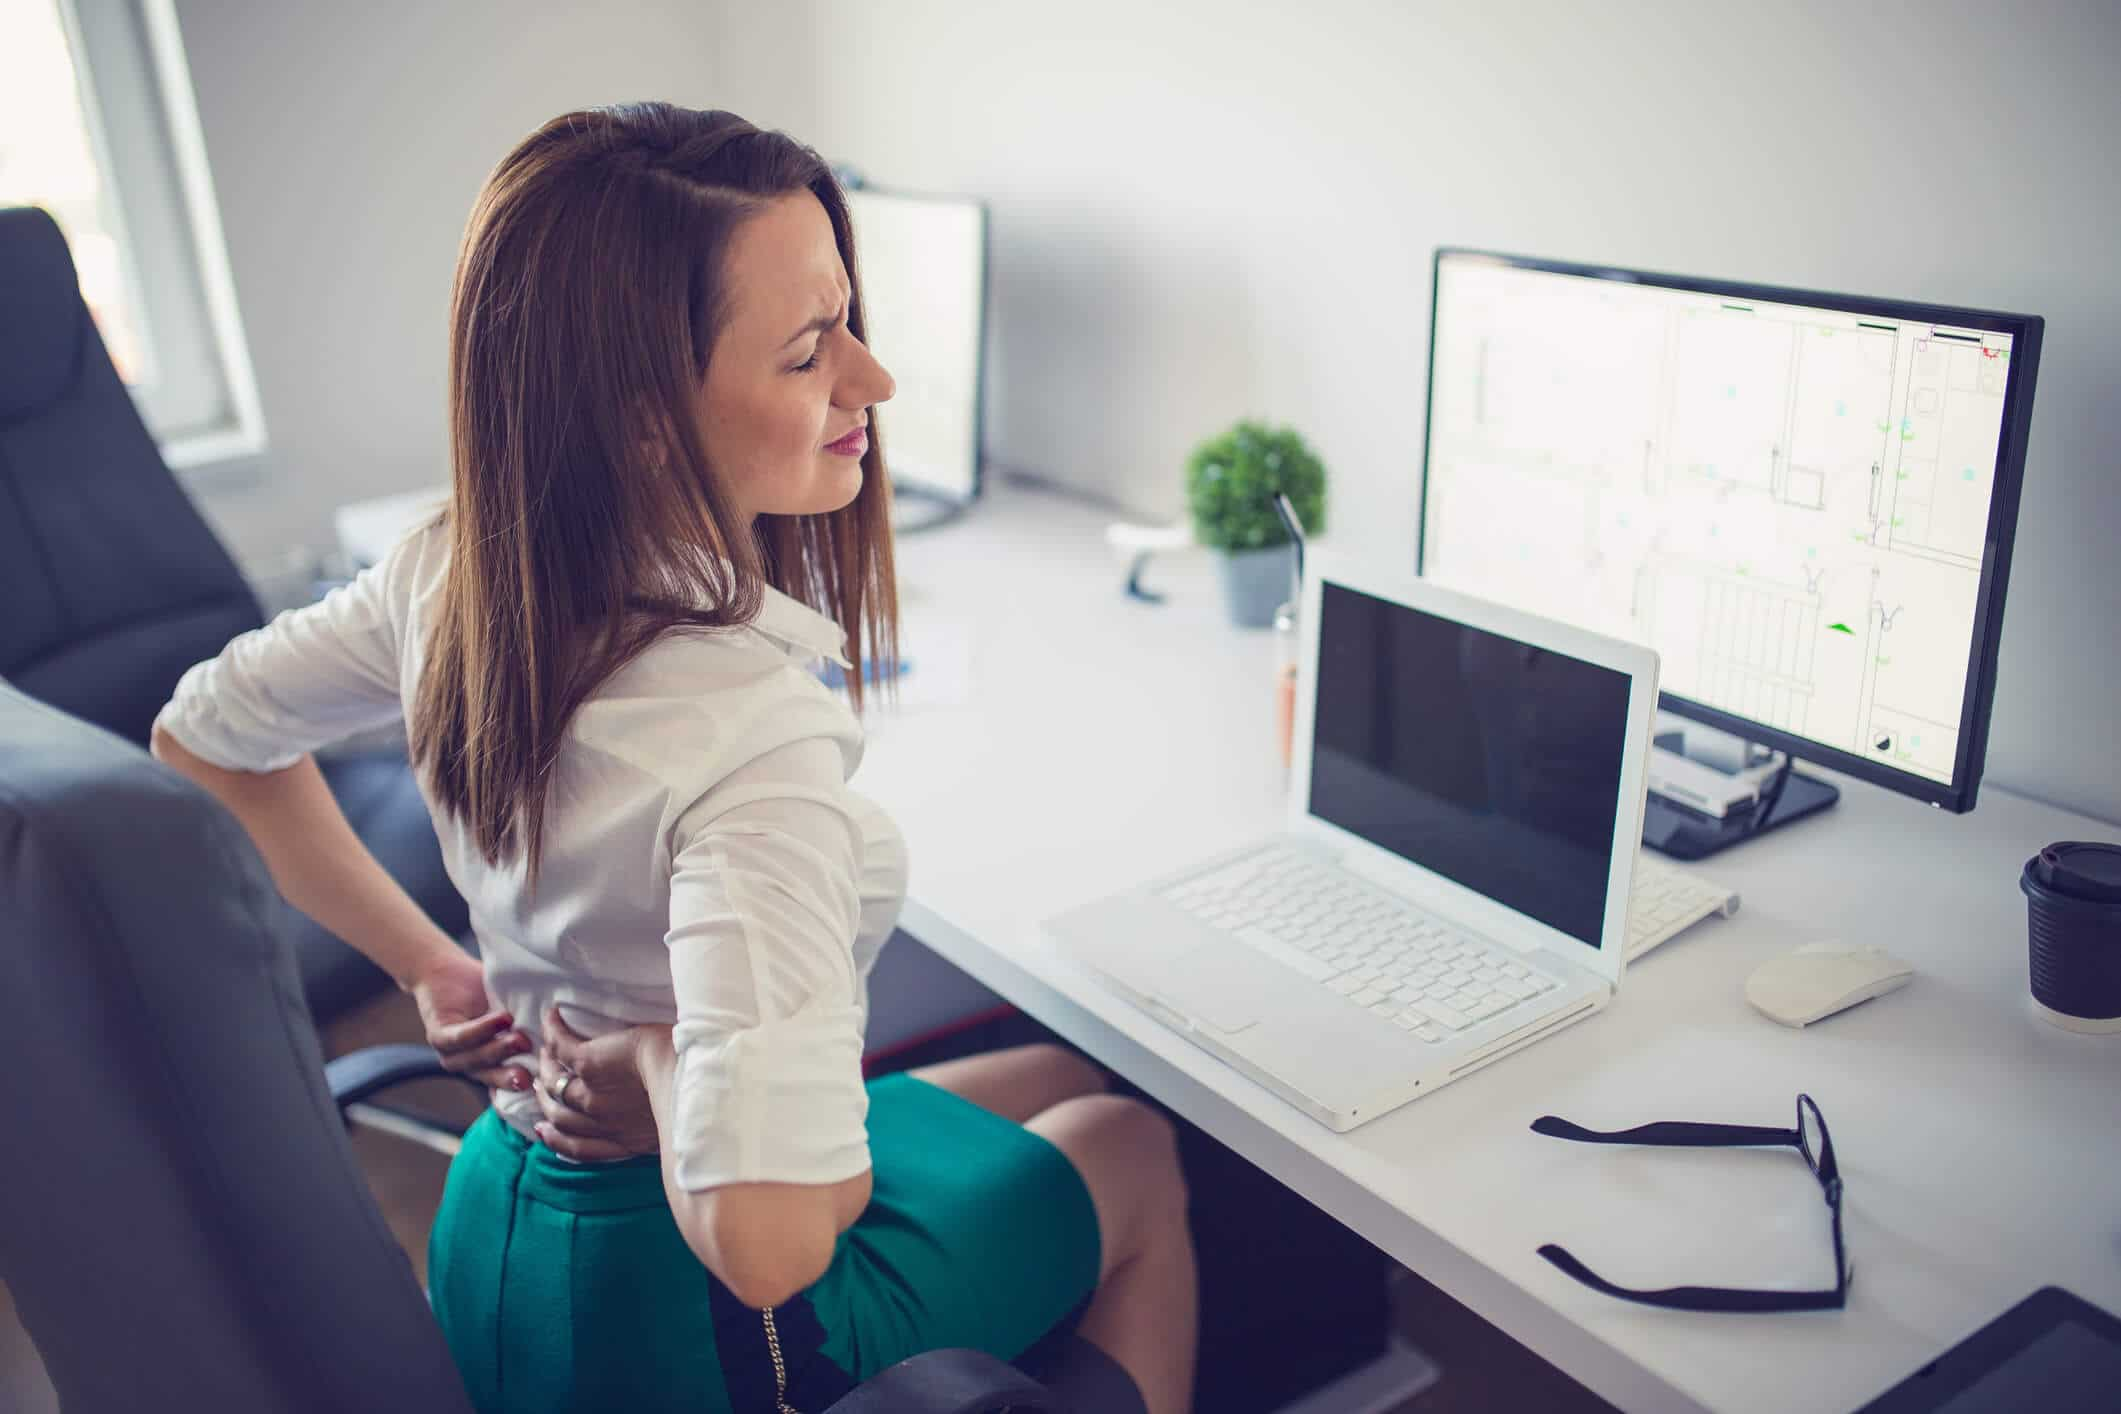 bra for long working hour - 5 Best Women Stylish Bra For Your Long Working Hour